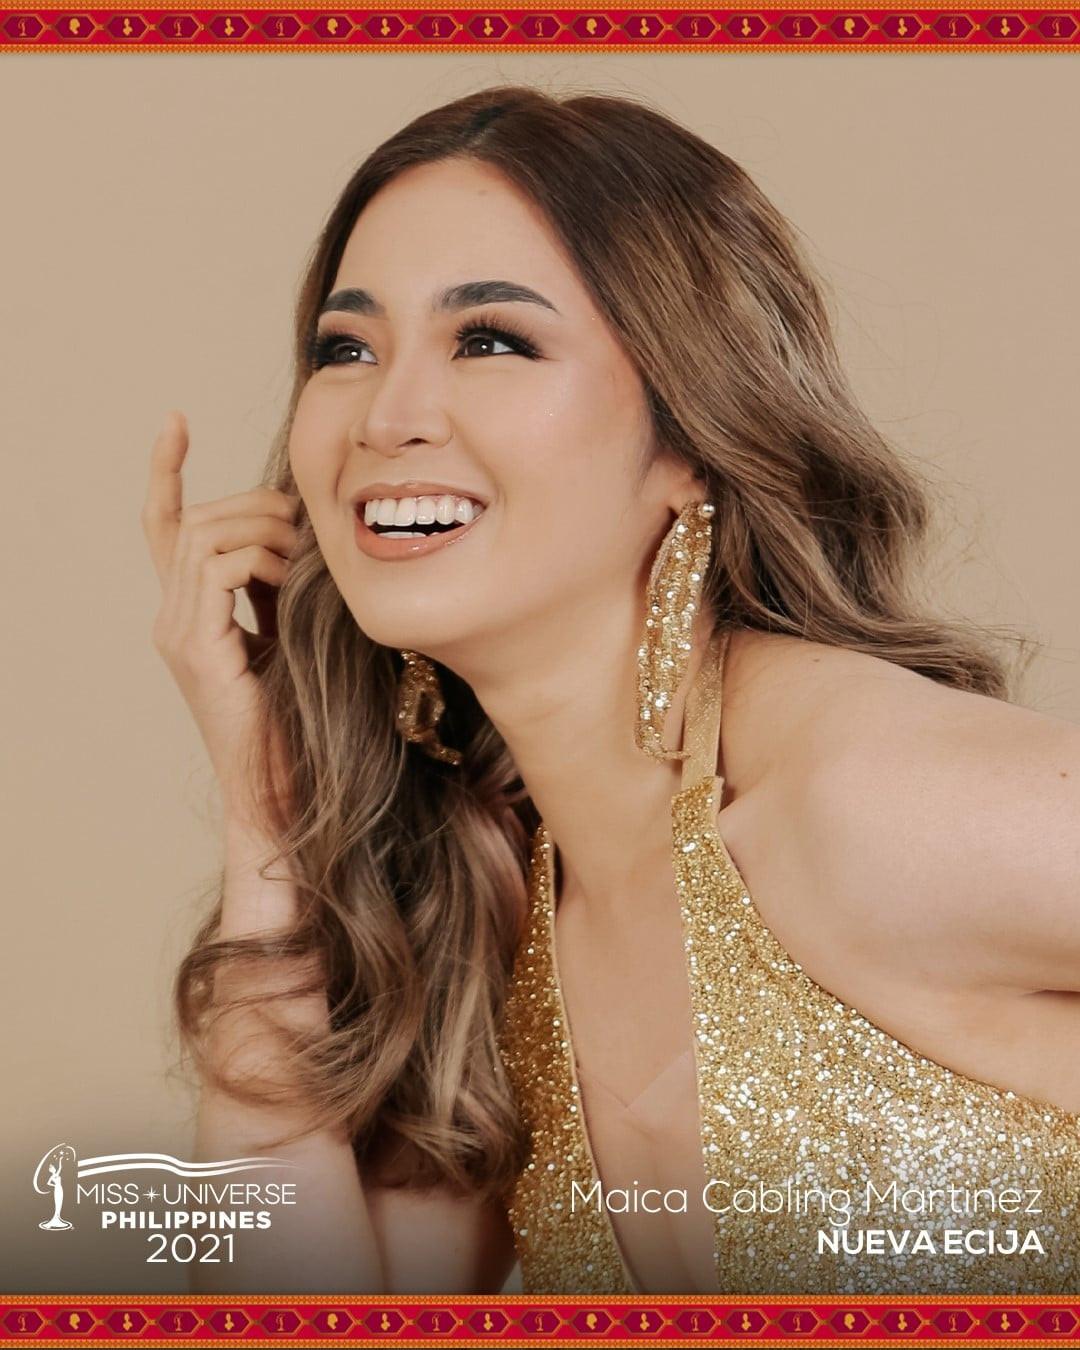 50 pre-candidatas a miss universe philippines 2021. - Página 3 REFyJe